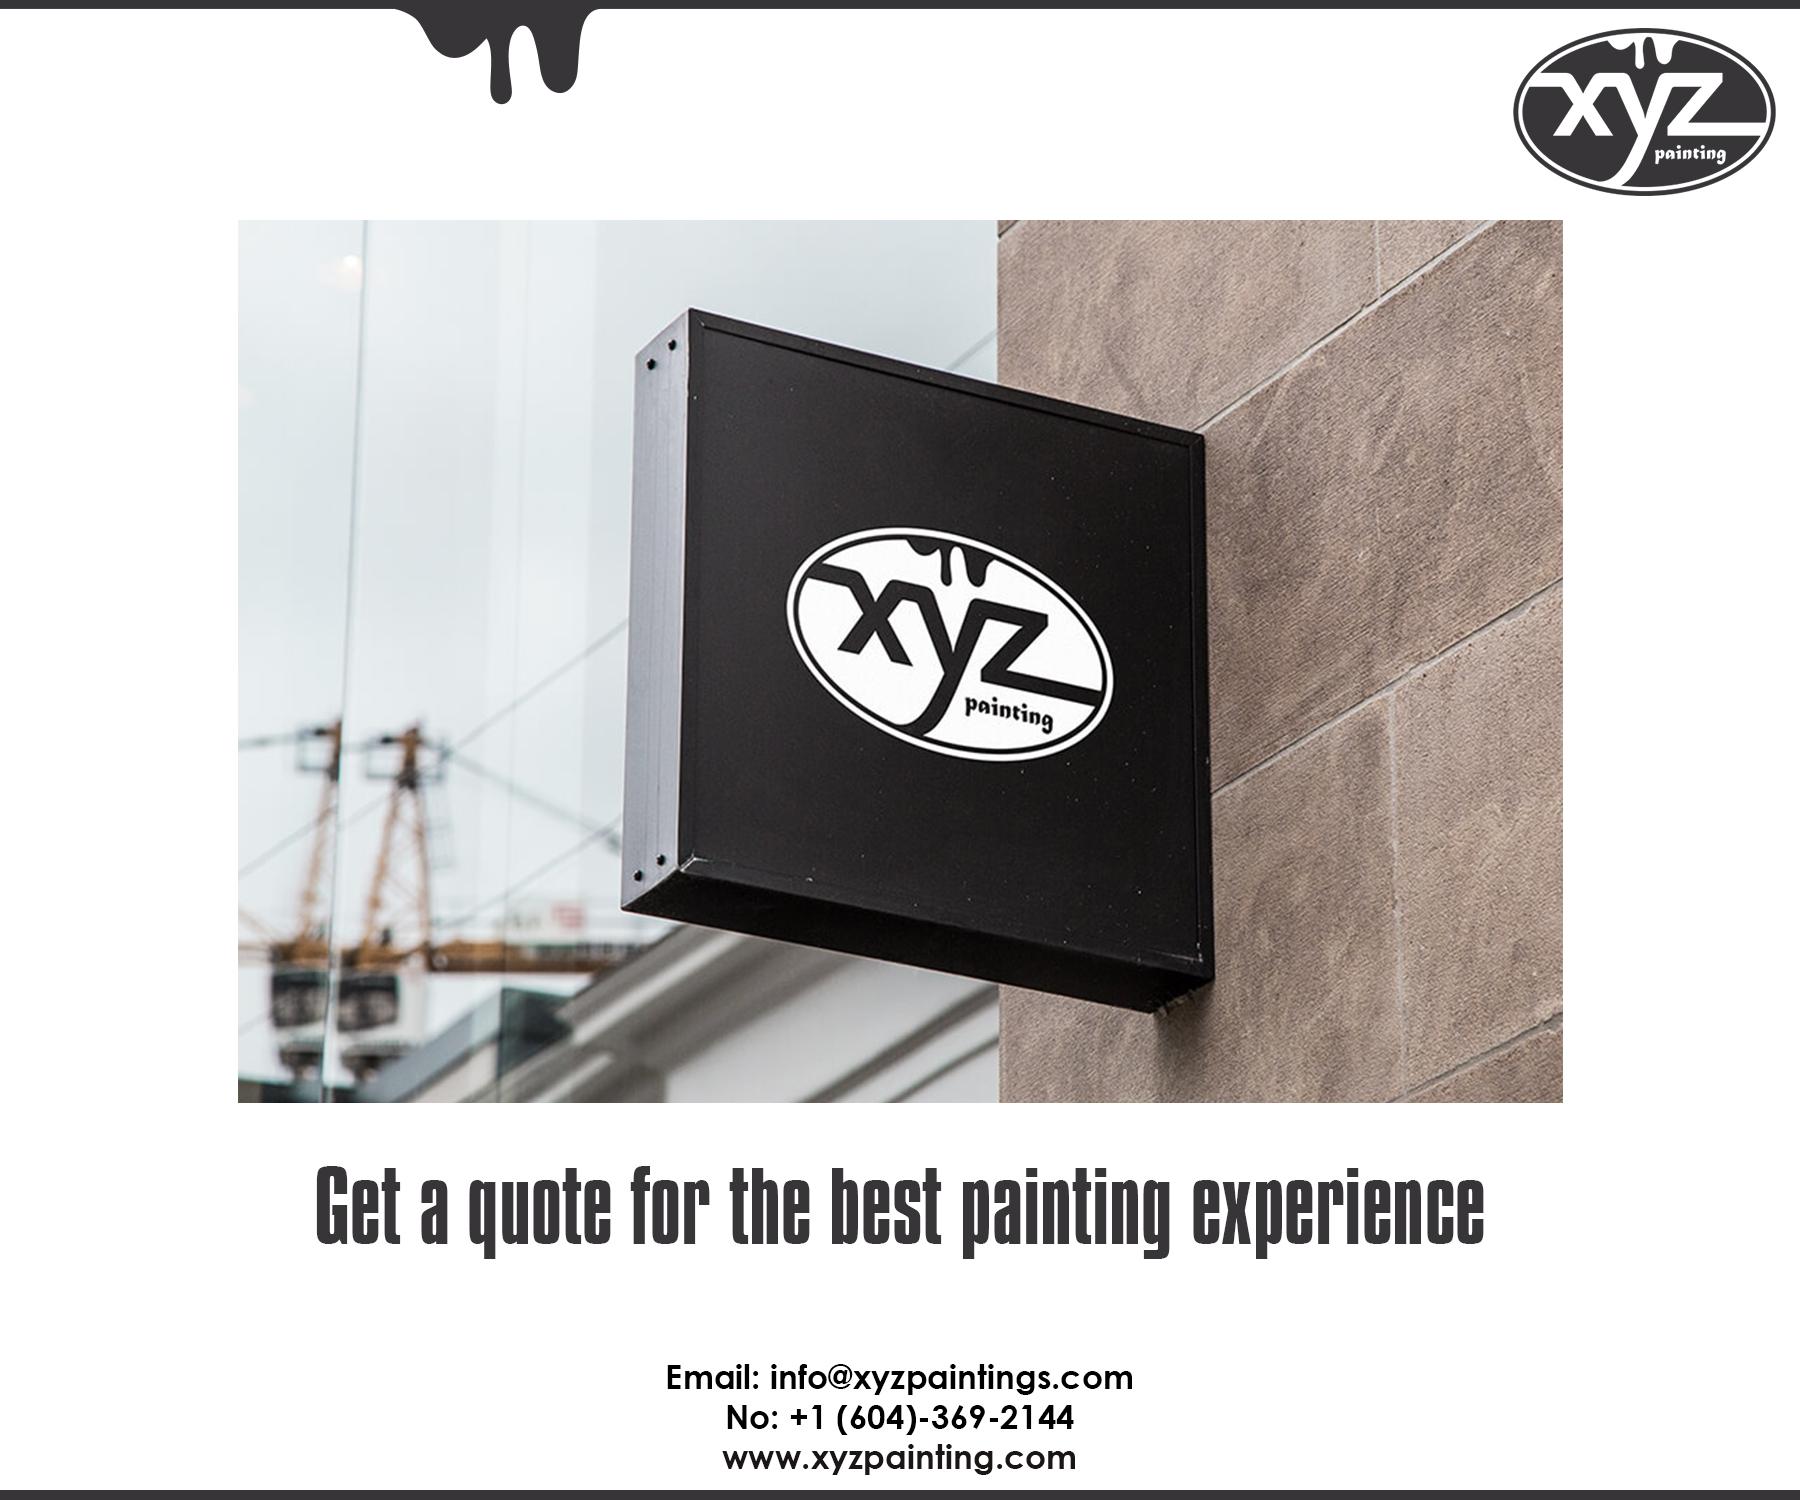 Painting Companies Near Me - XYZ Painting